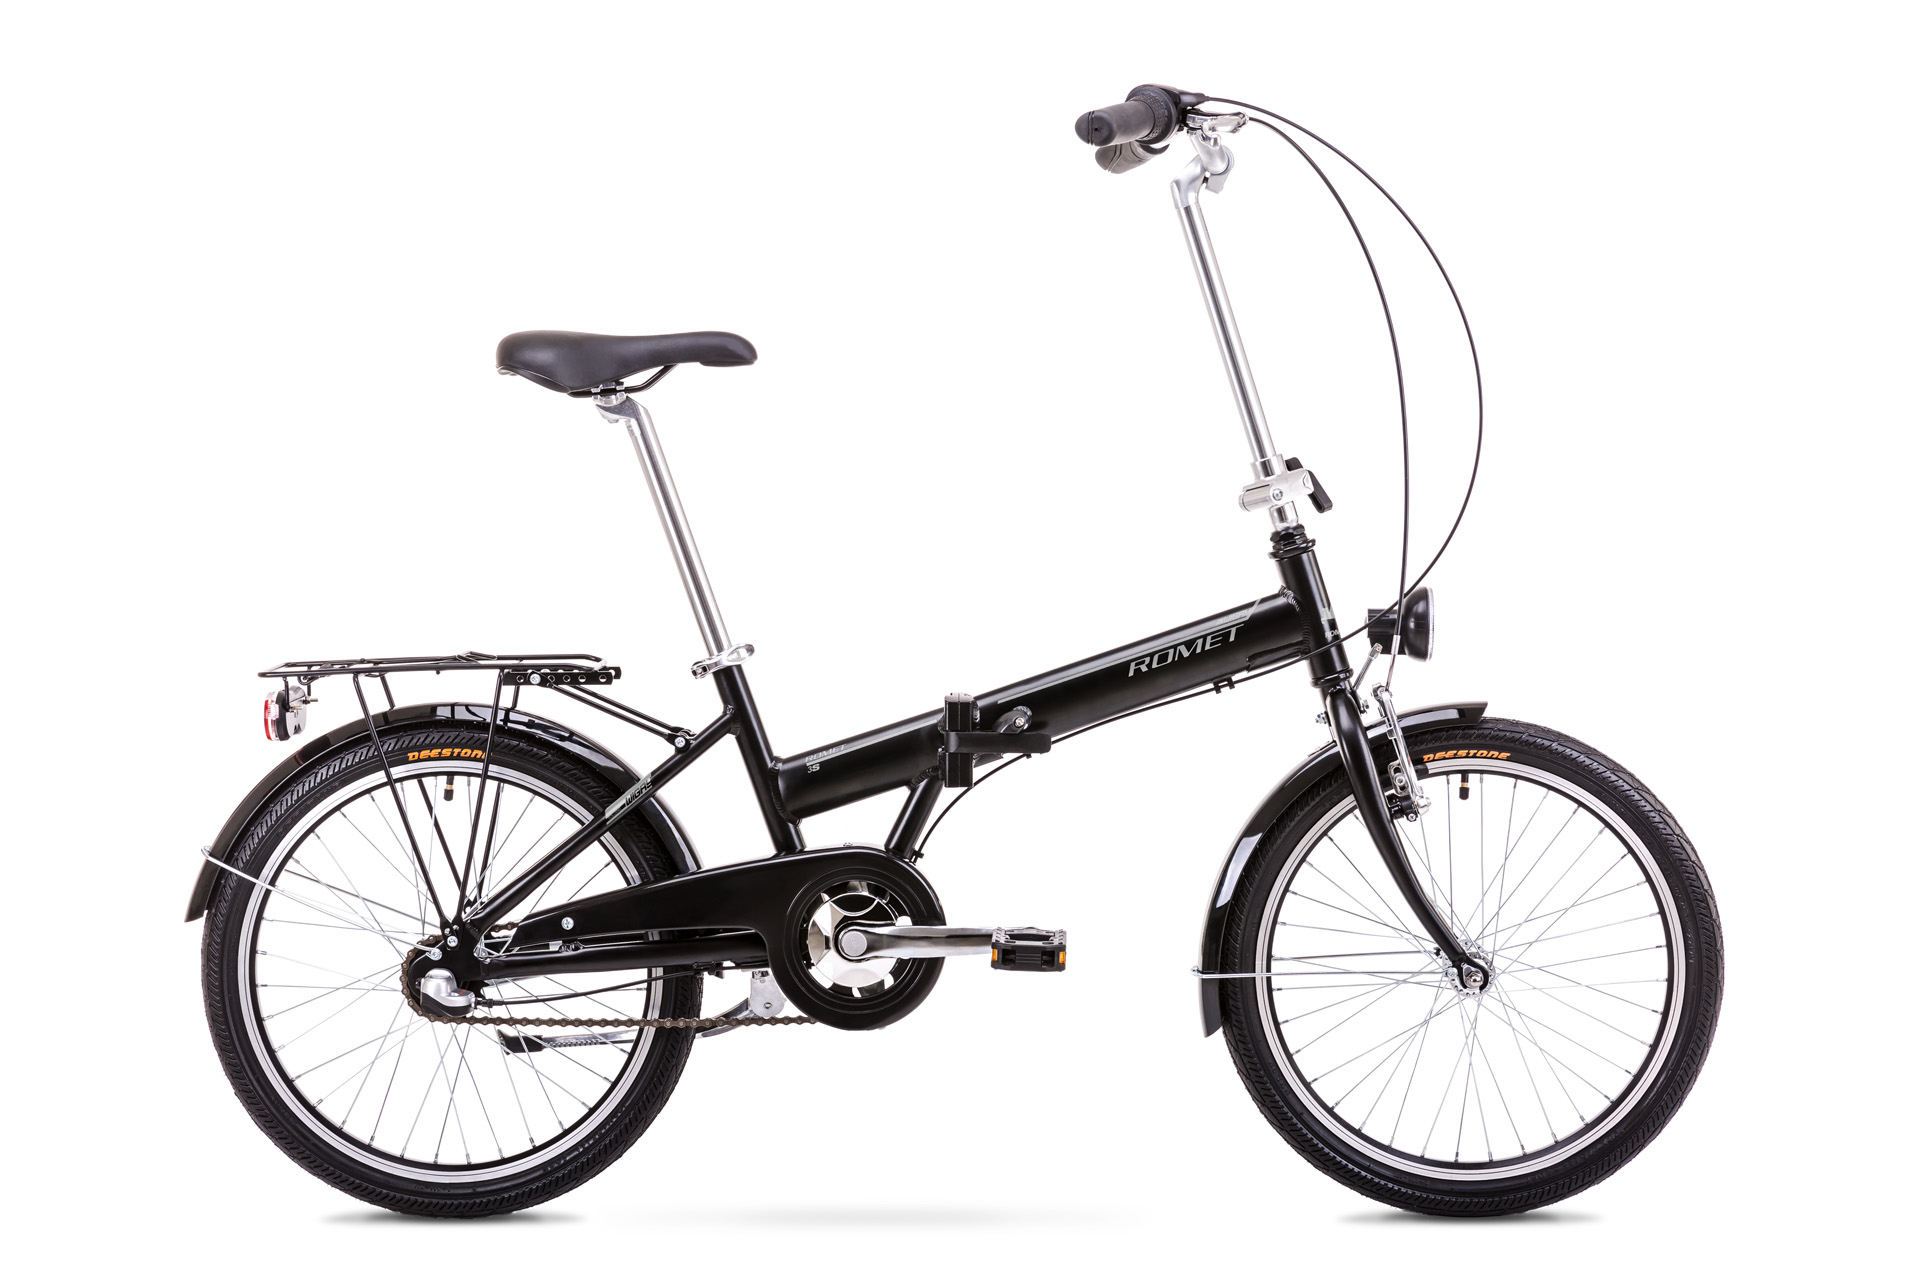 Bicicleta pliabila Unisex Romet Wigry 3 Negru/Argintiu 2019 imagine